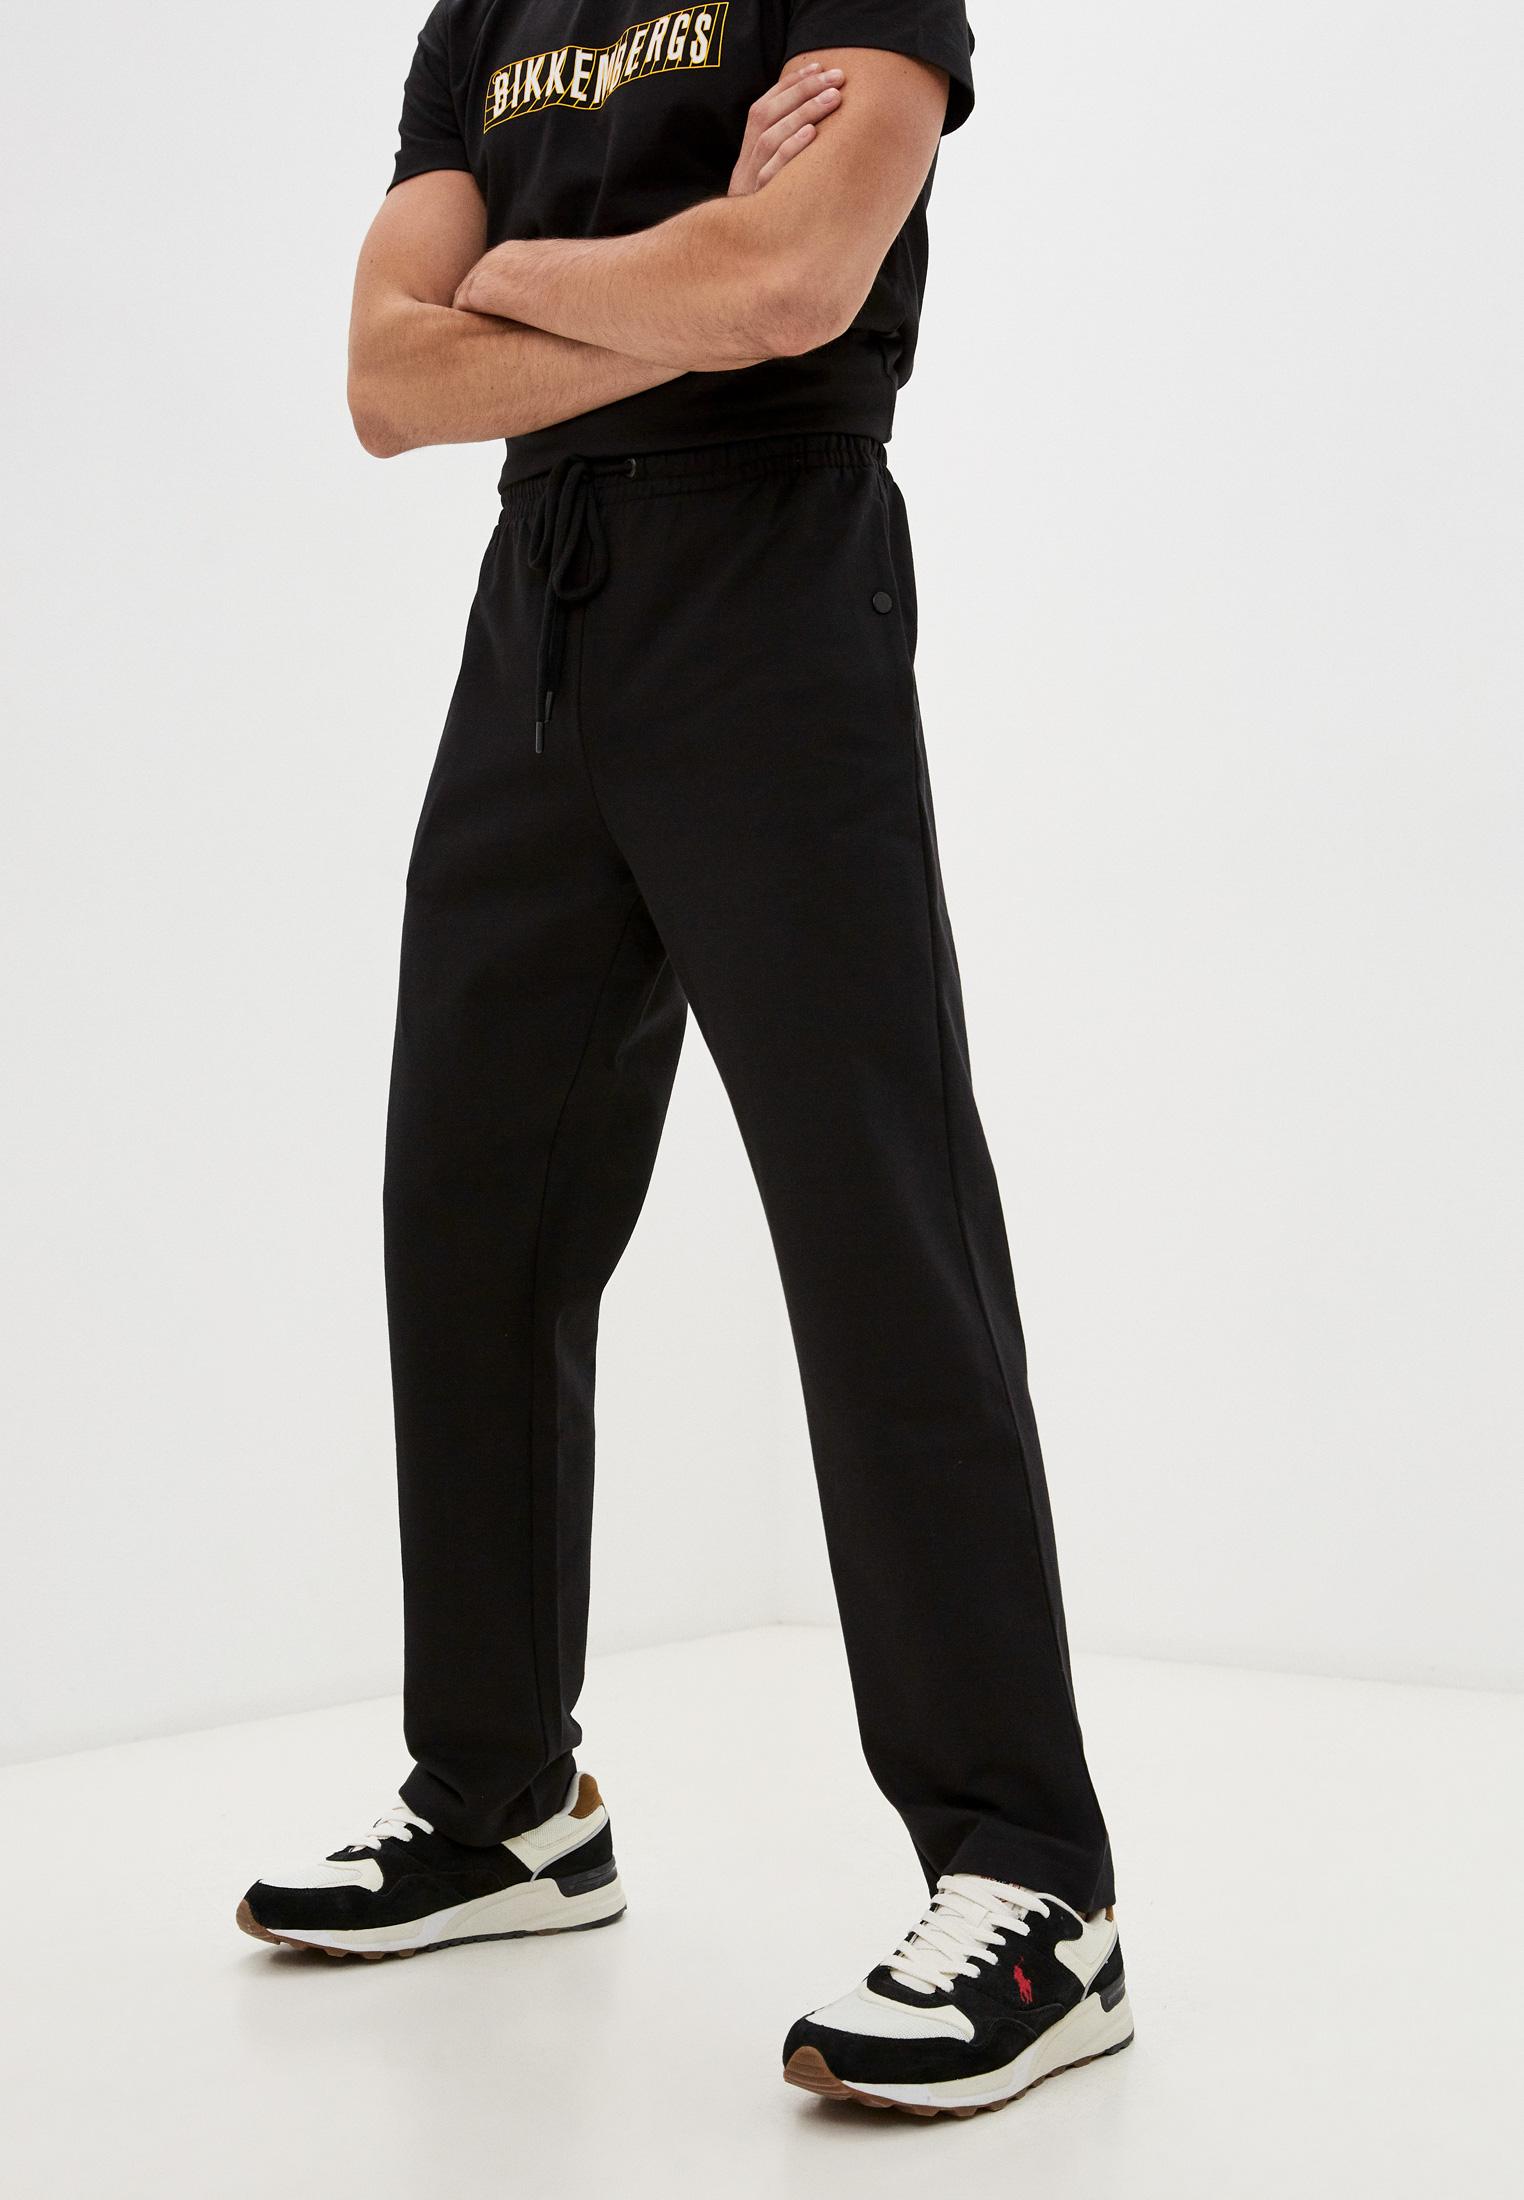 Мужские спортивные брюки Bikkembergs (Биккембергс) C 1 213 80 E 2276